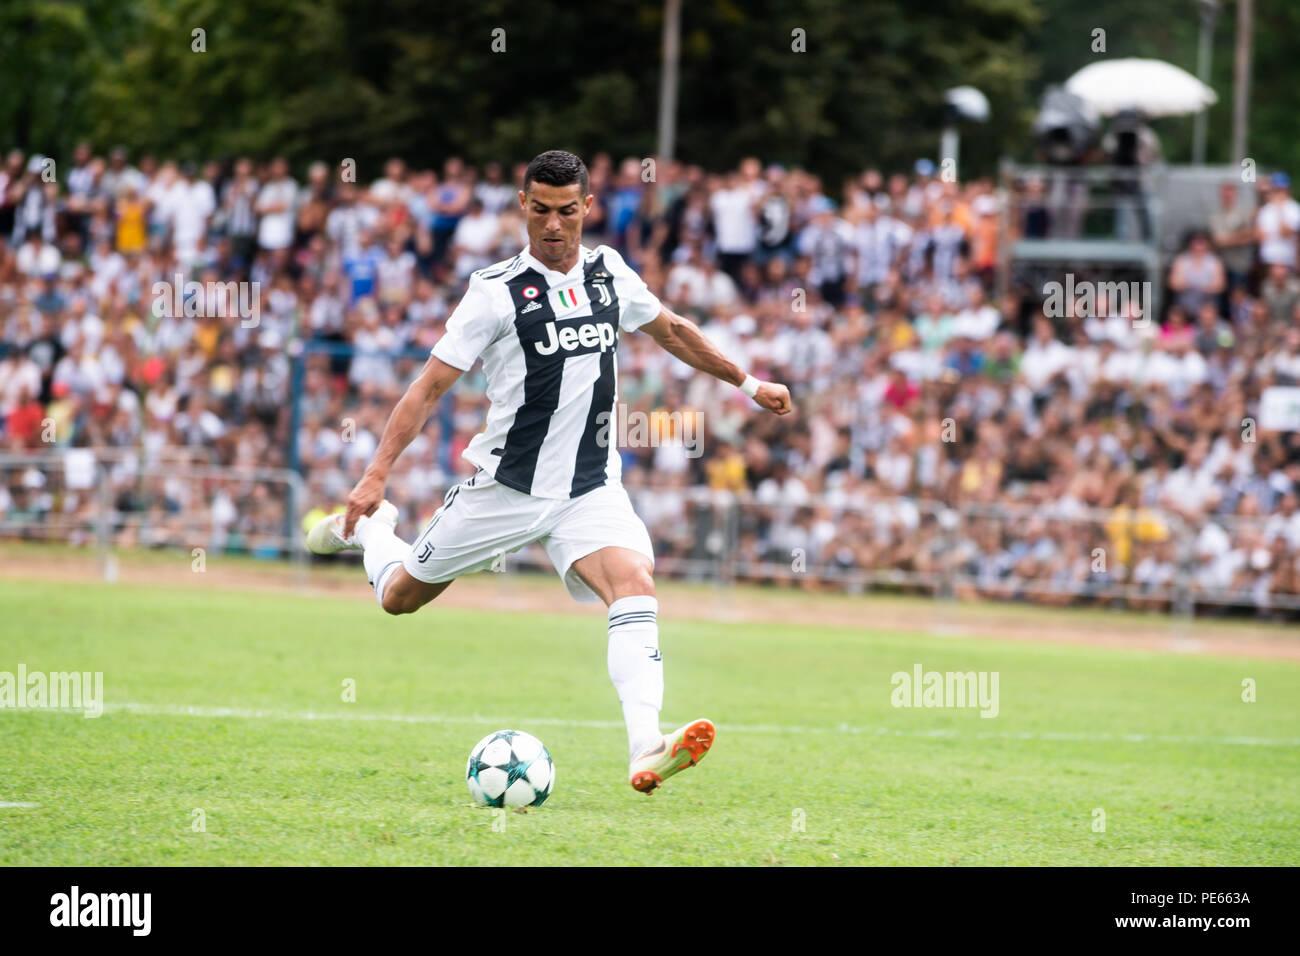 Turin Italy 12th Aug 2018 Cristiano Ronaldo Juventus During The Serie A Preseaosn Match Juventus Vs